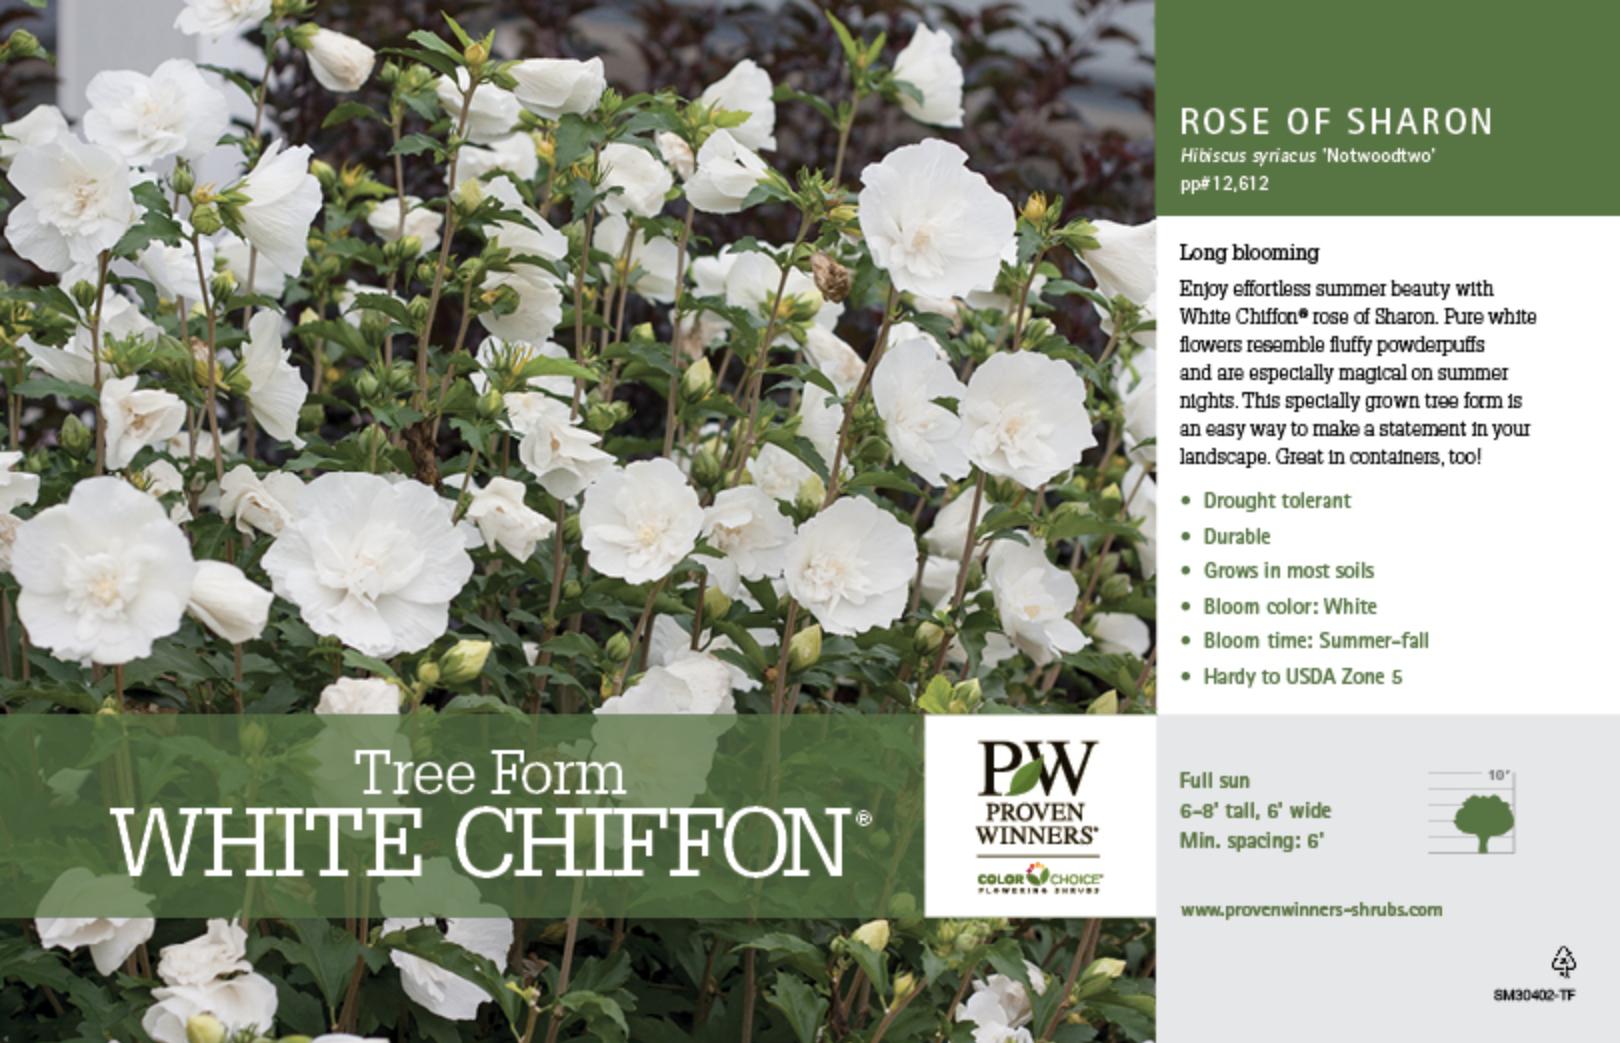 Hibiscus White Chiffon Tree Form Rose Of Sharon 11x7 Variety